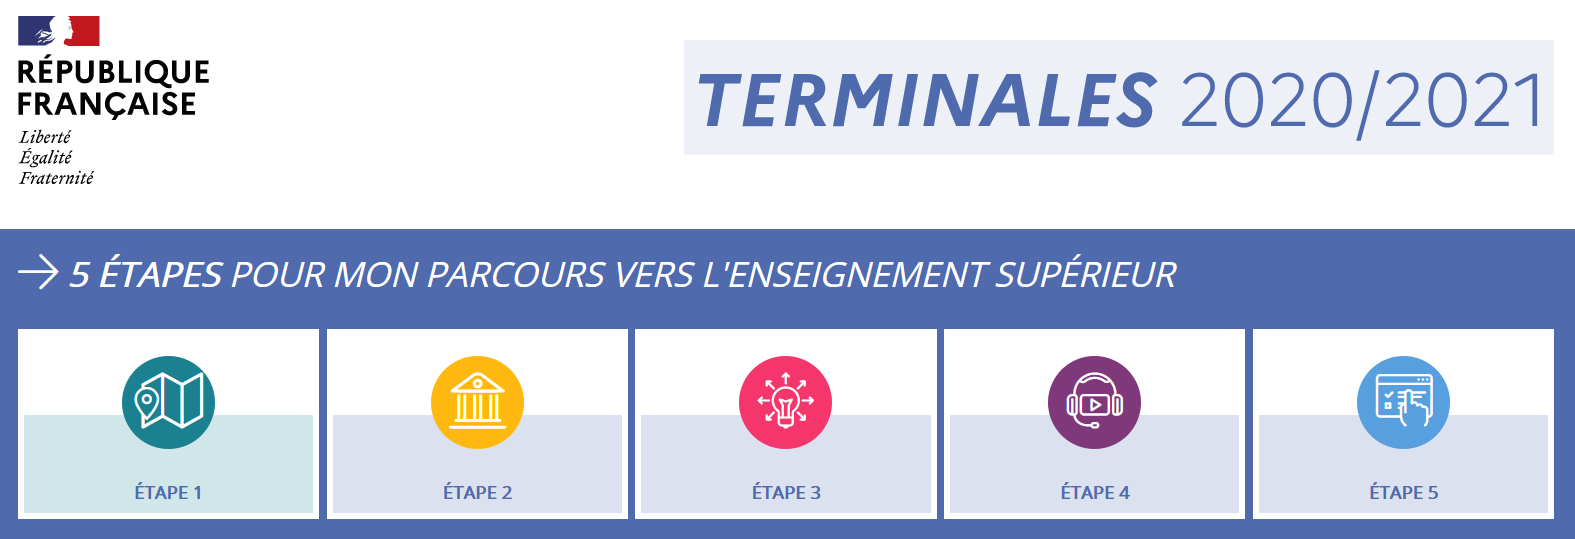 Terminales 2020-2021.png